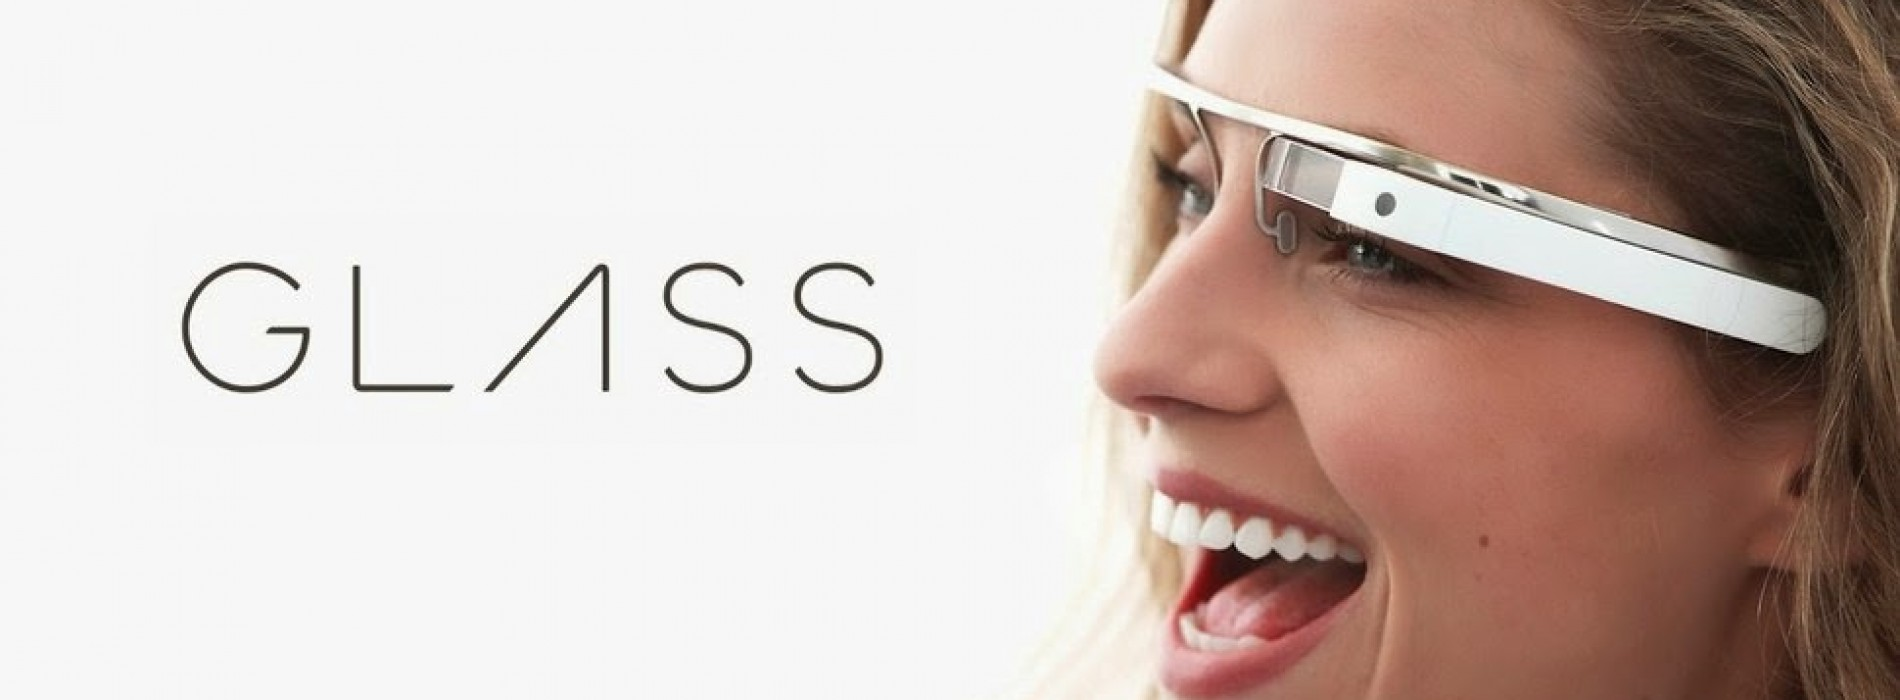 New update arrives for Google Glass